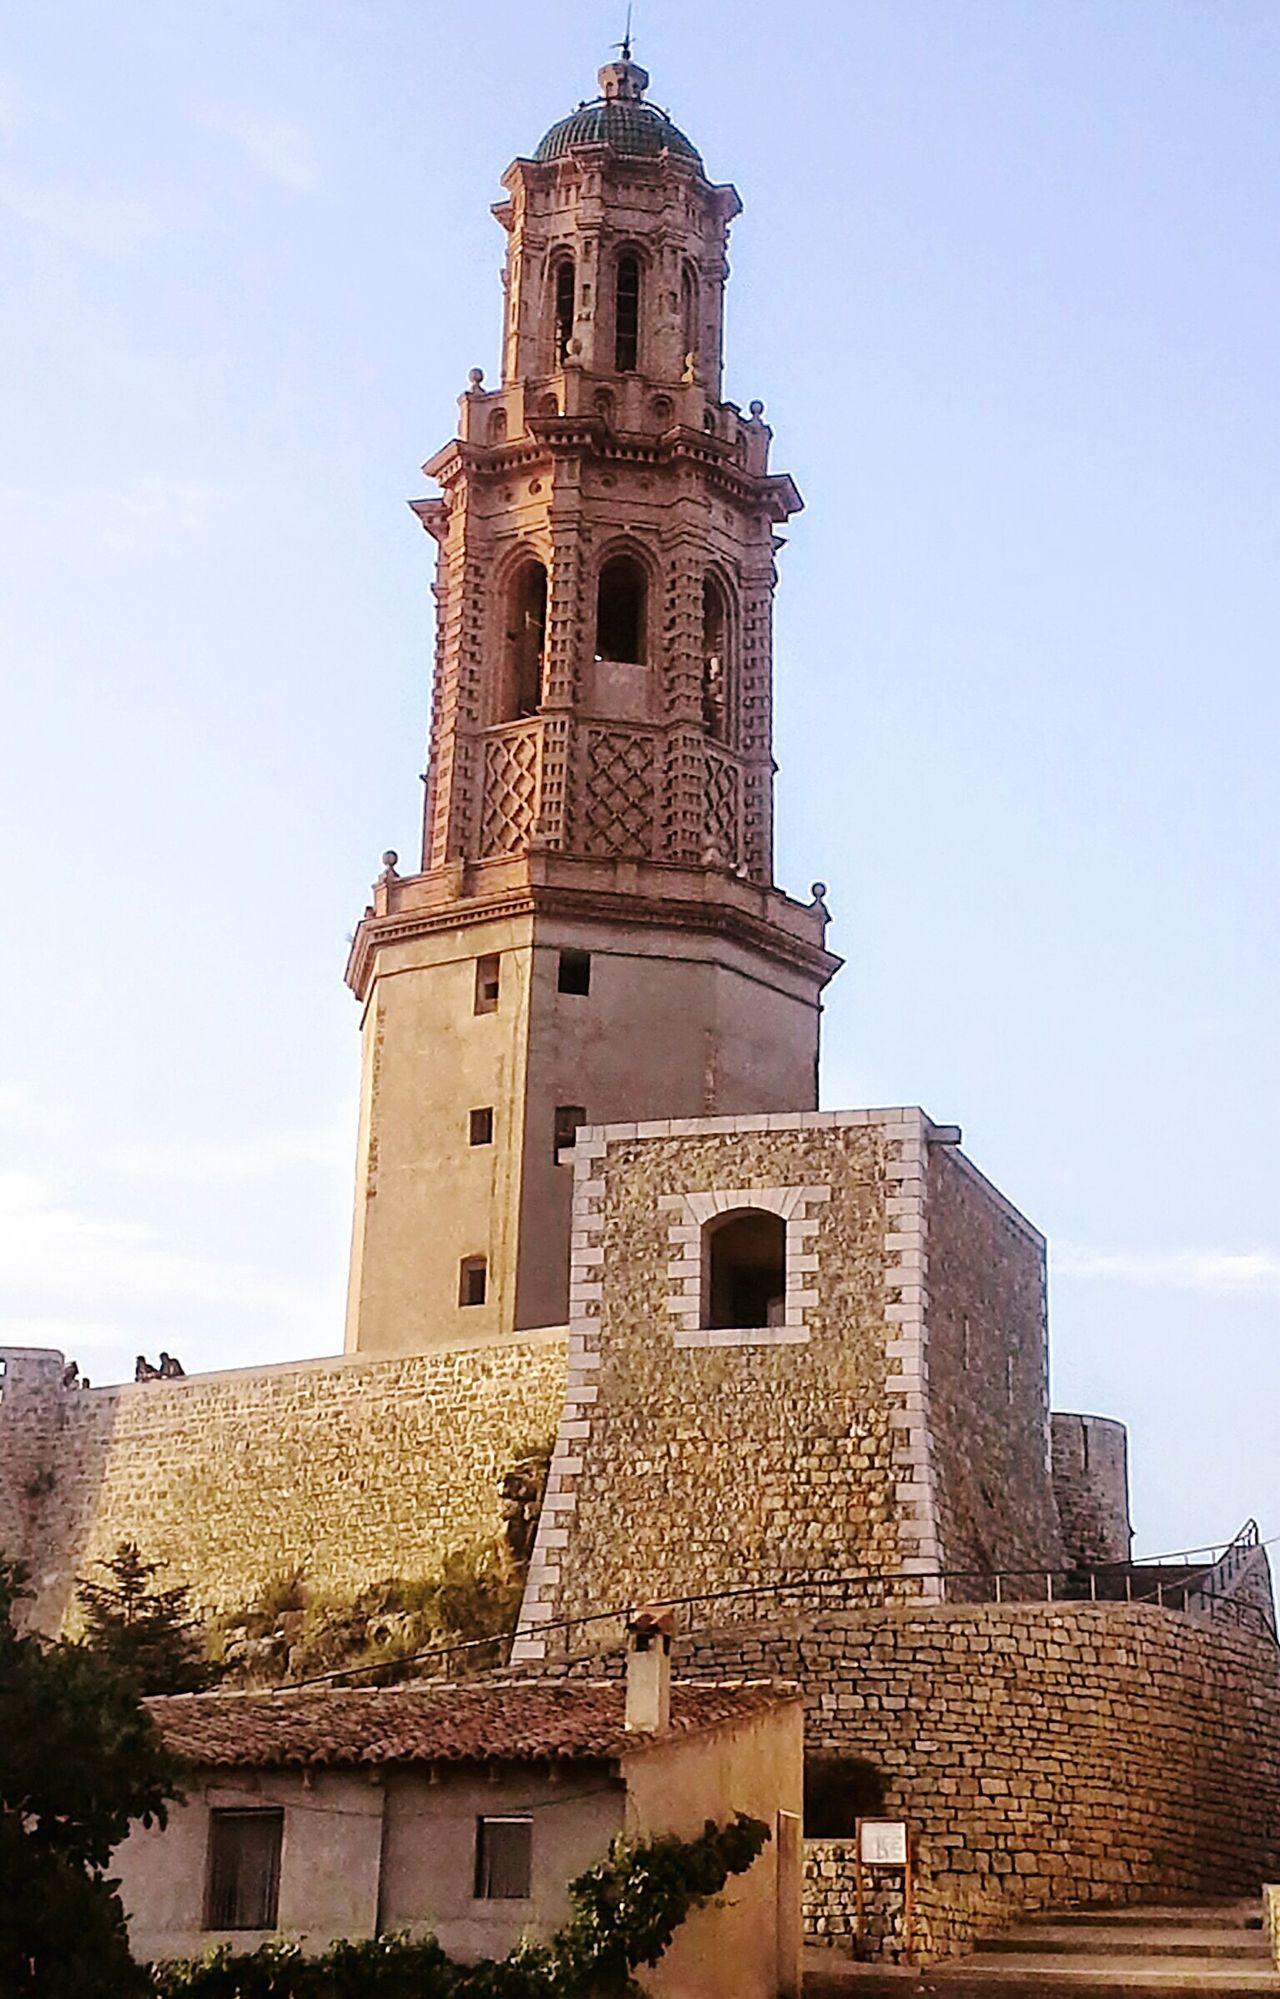 Torre Mudejar Art Jerica Castellón Architecture Historycal Place Arabic Style Eyeemphotography RuralTreasures Patrimônio Histórico The Architect - 2017 EyeEm Awards EyEmNewHere